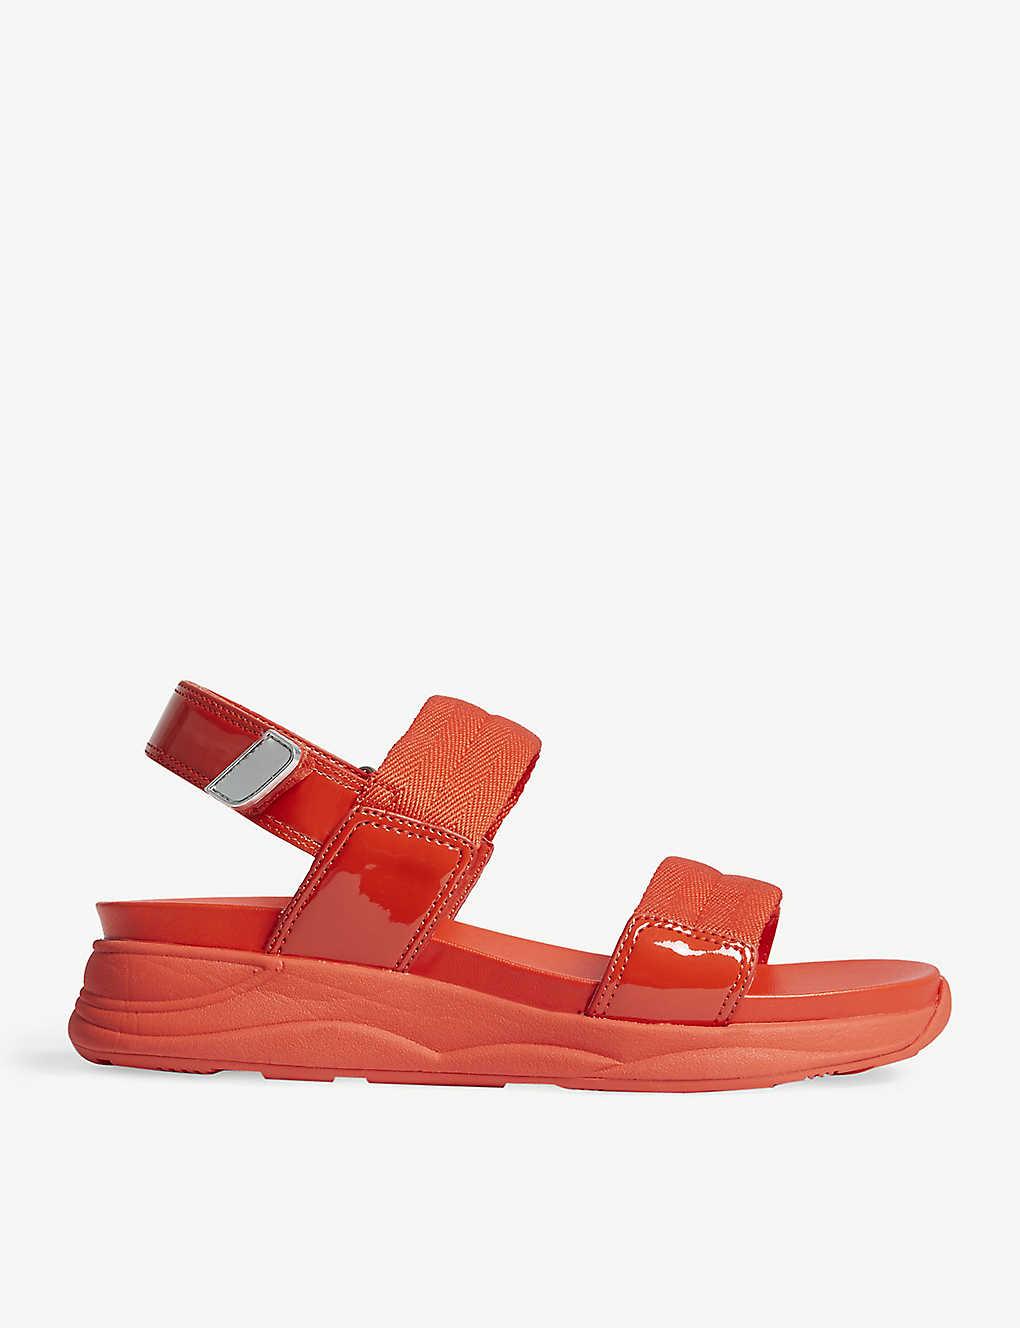 4d086fd7d80809 ALDO - Eloima open toe sandals